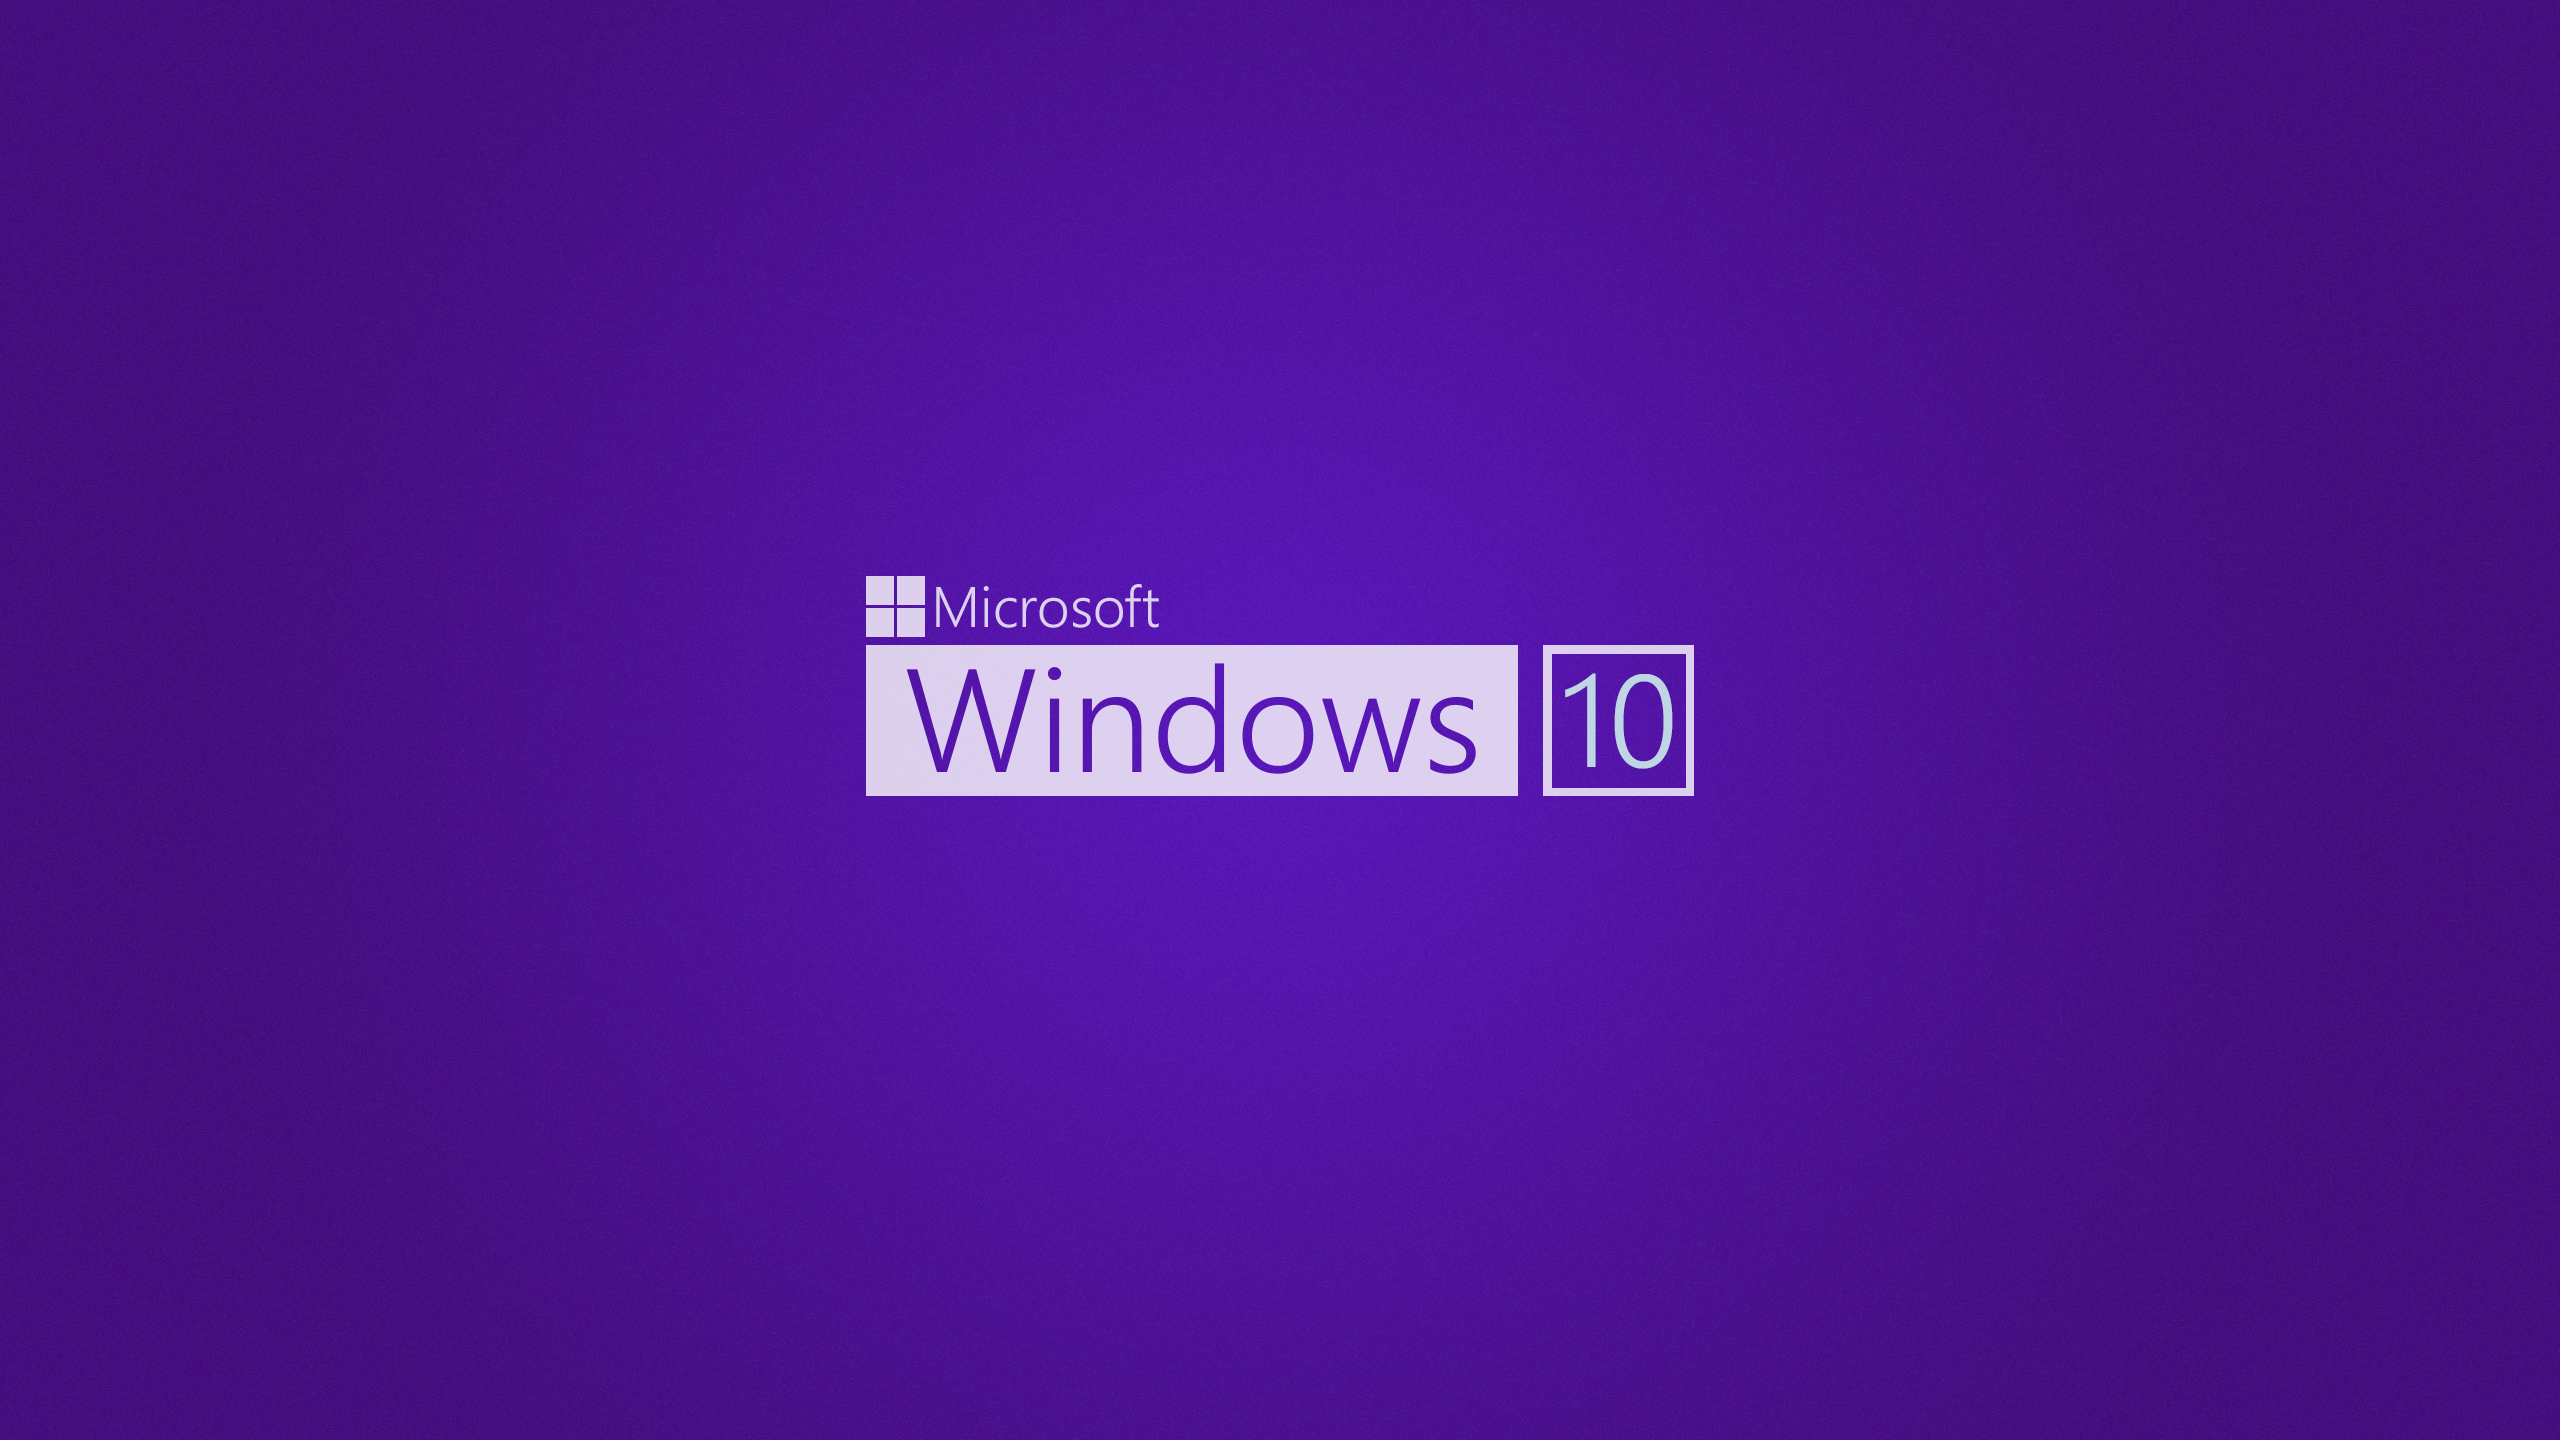 Hd wallpaper win 10 - Amazing Windows 10 Wallpapers Wallpapersafari